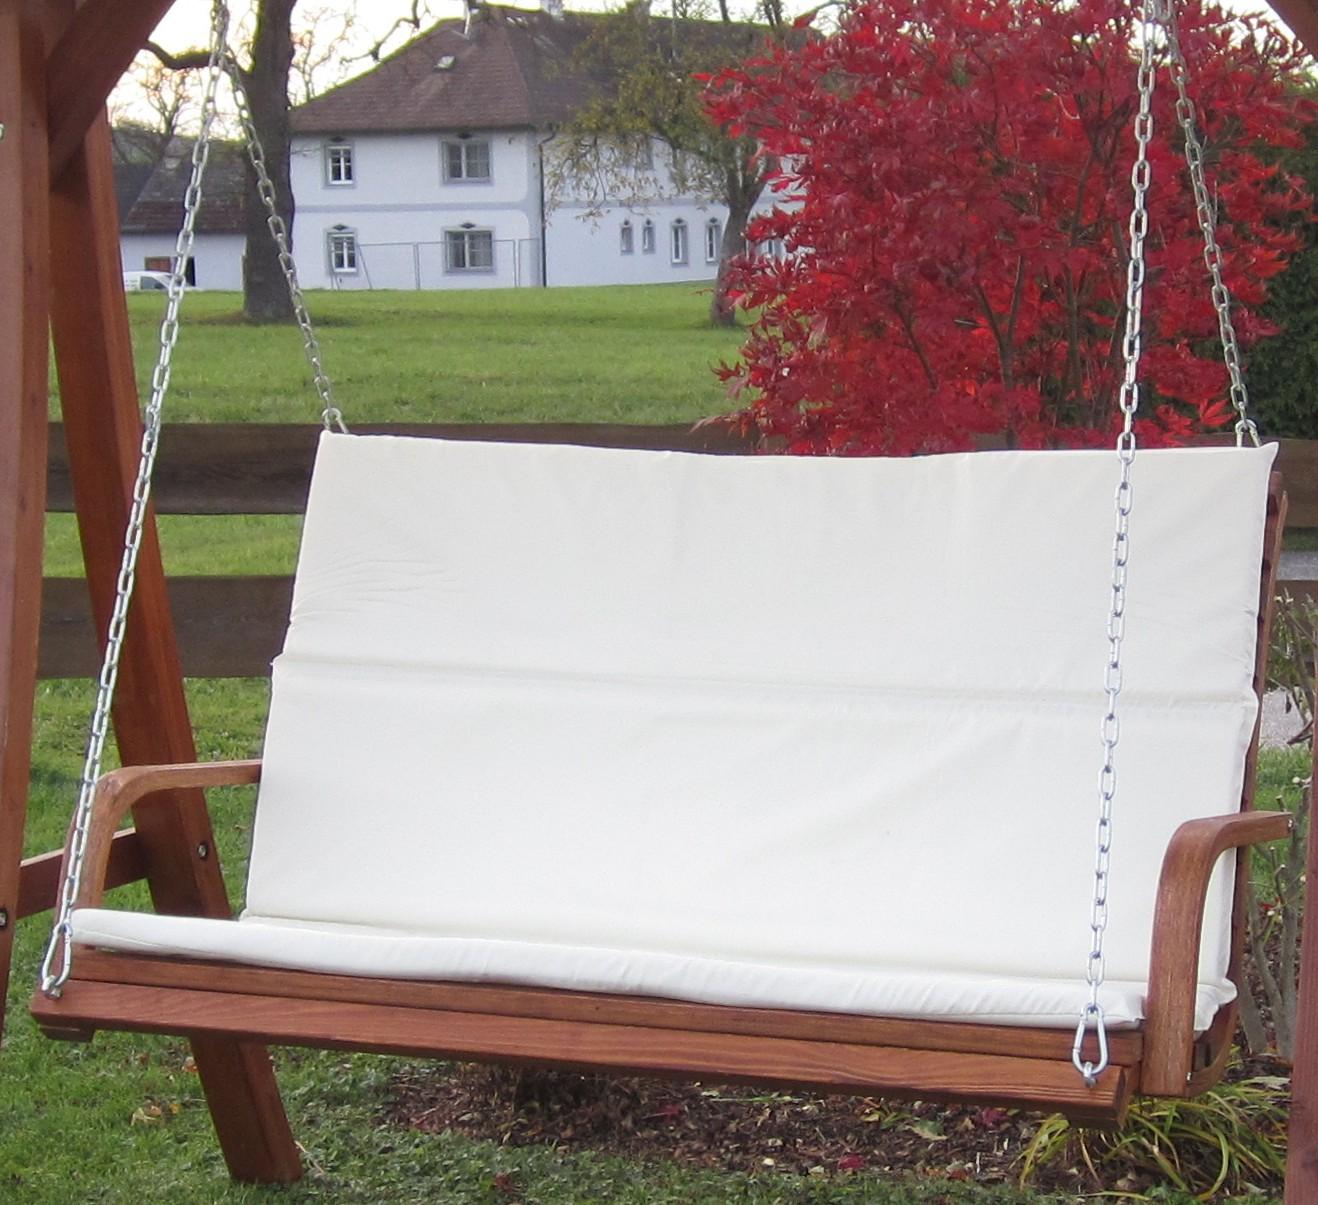 design bank aus holz l rche f r hollywoodschaukel 2 sitzer kuredo ohne gestell alles f r. Black Bedroom Furniture Sets. Home Design Ideas